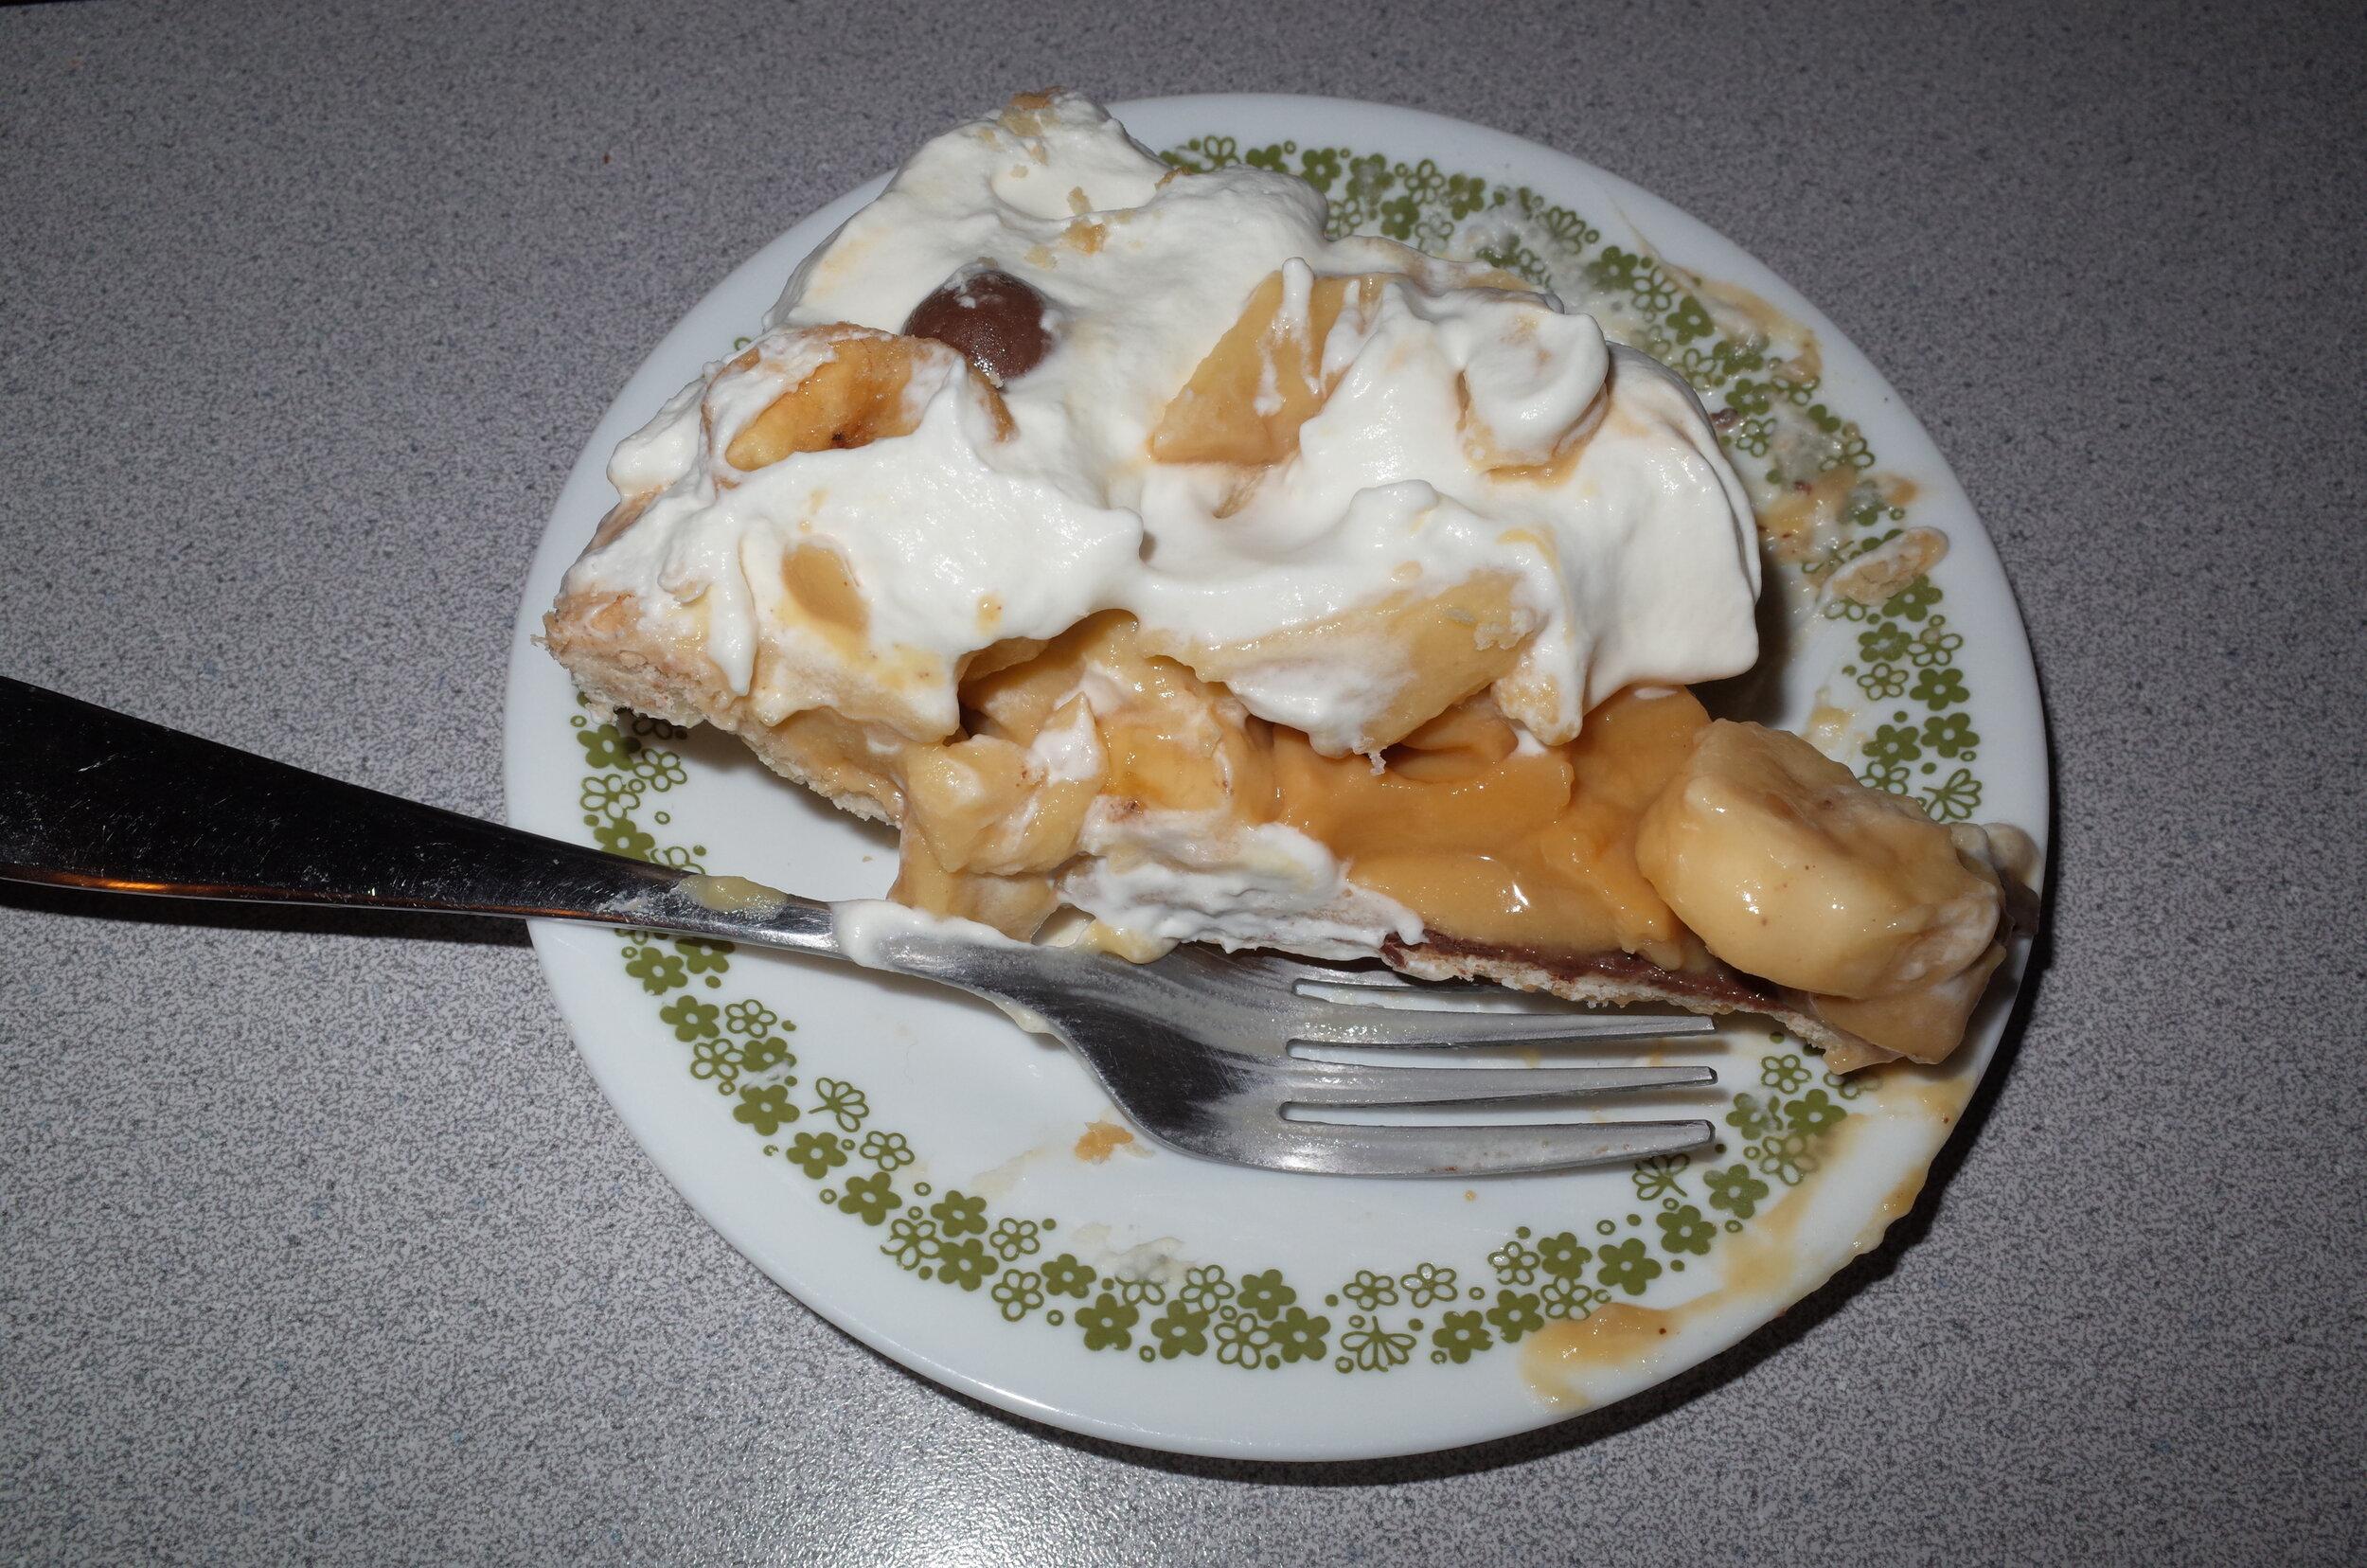 Caramel Banana Cream Pie, 2019